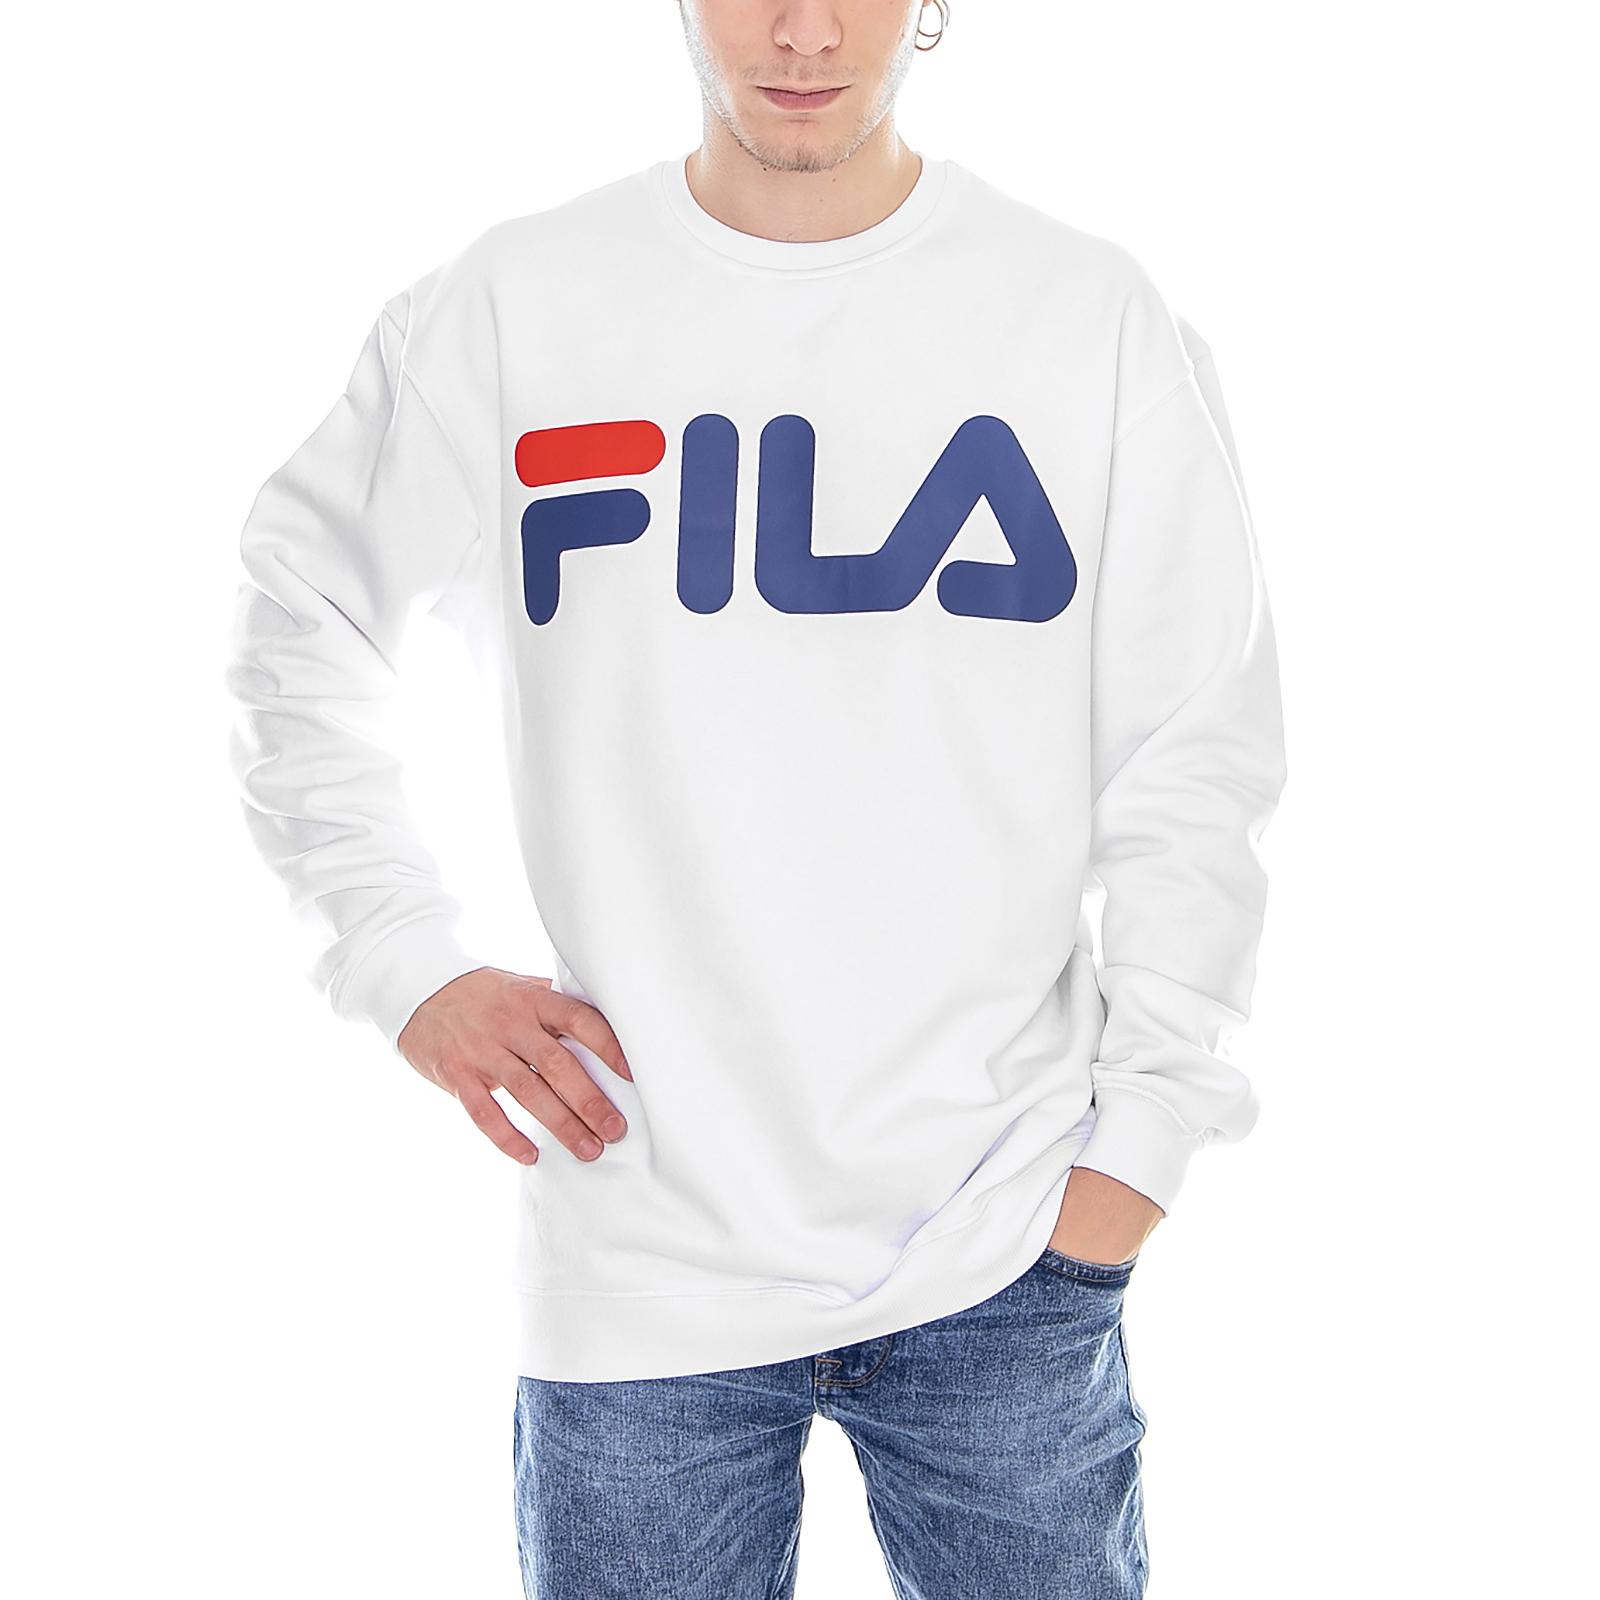 Fila felpa logo classic